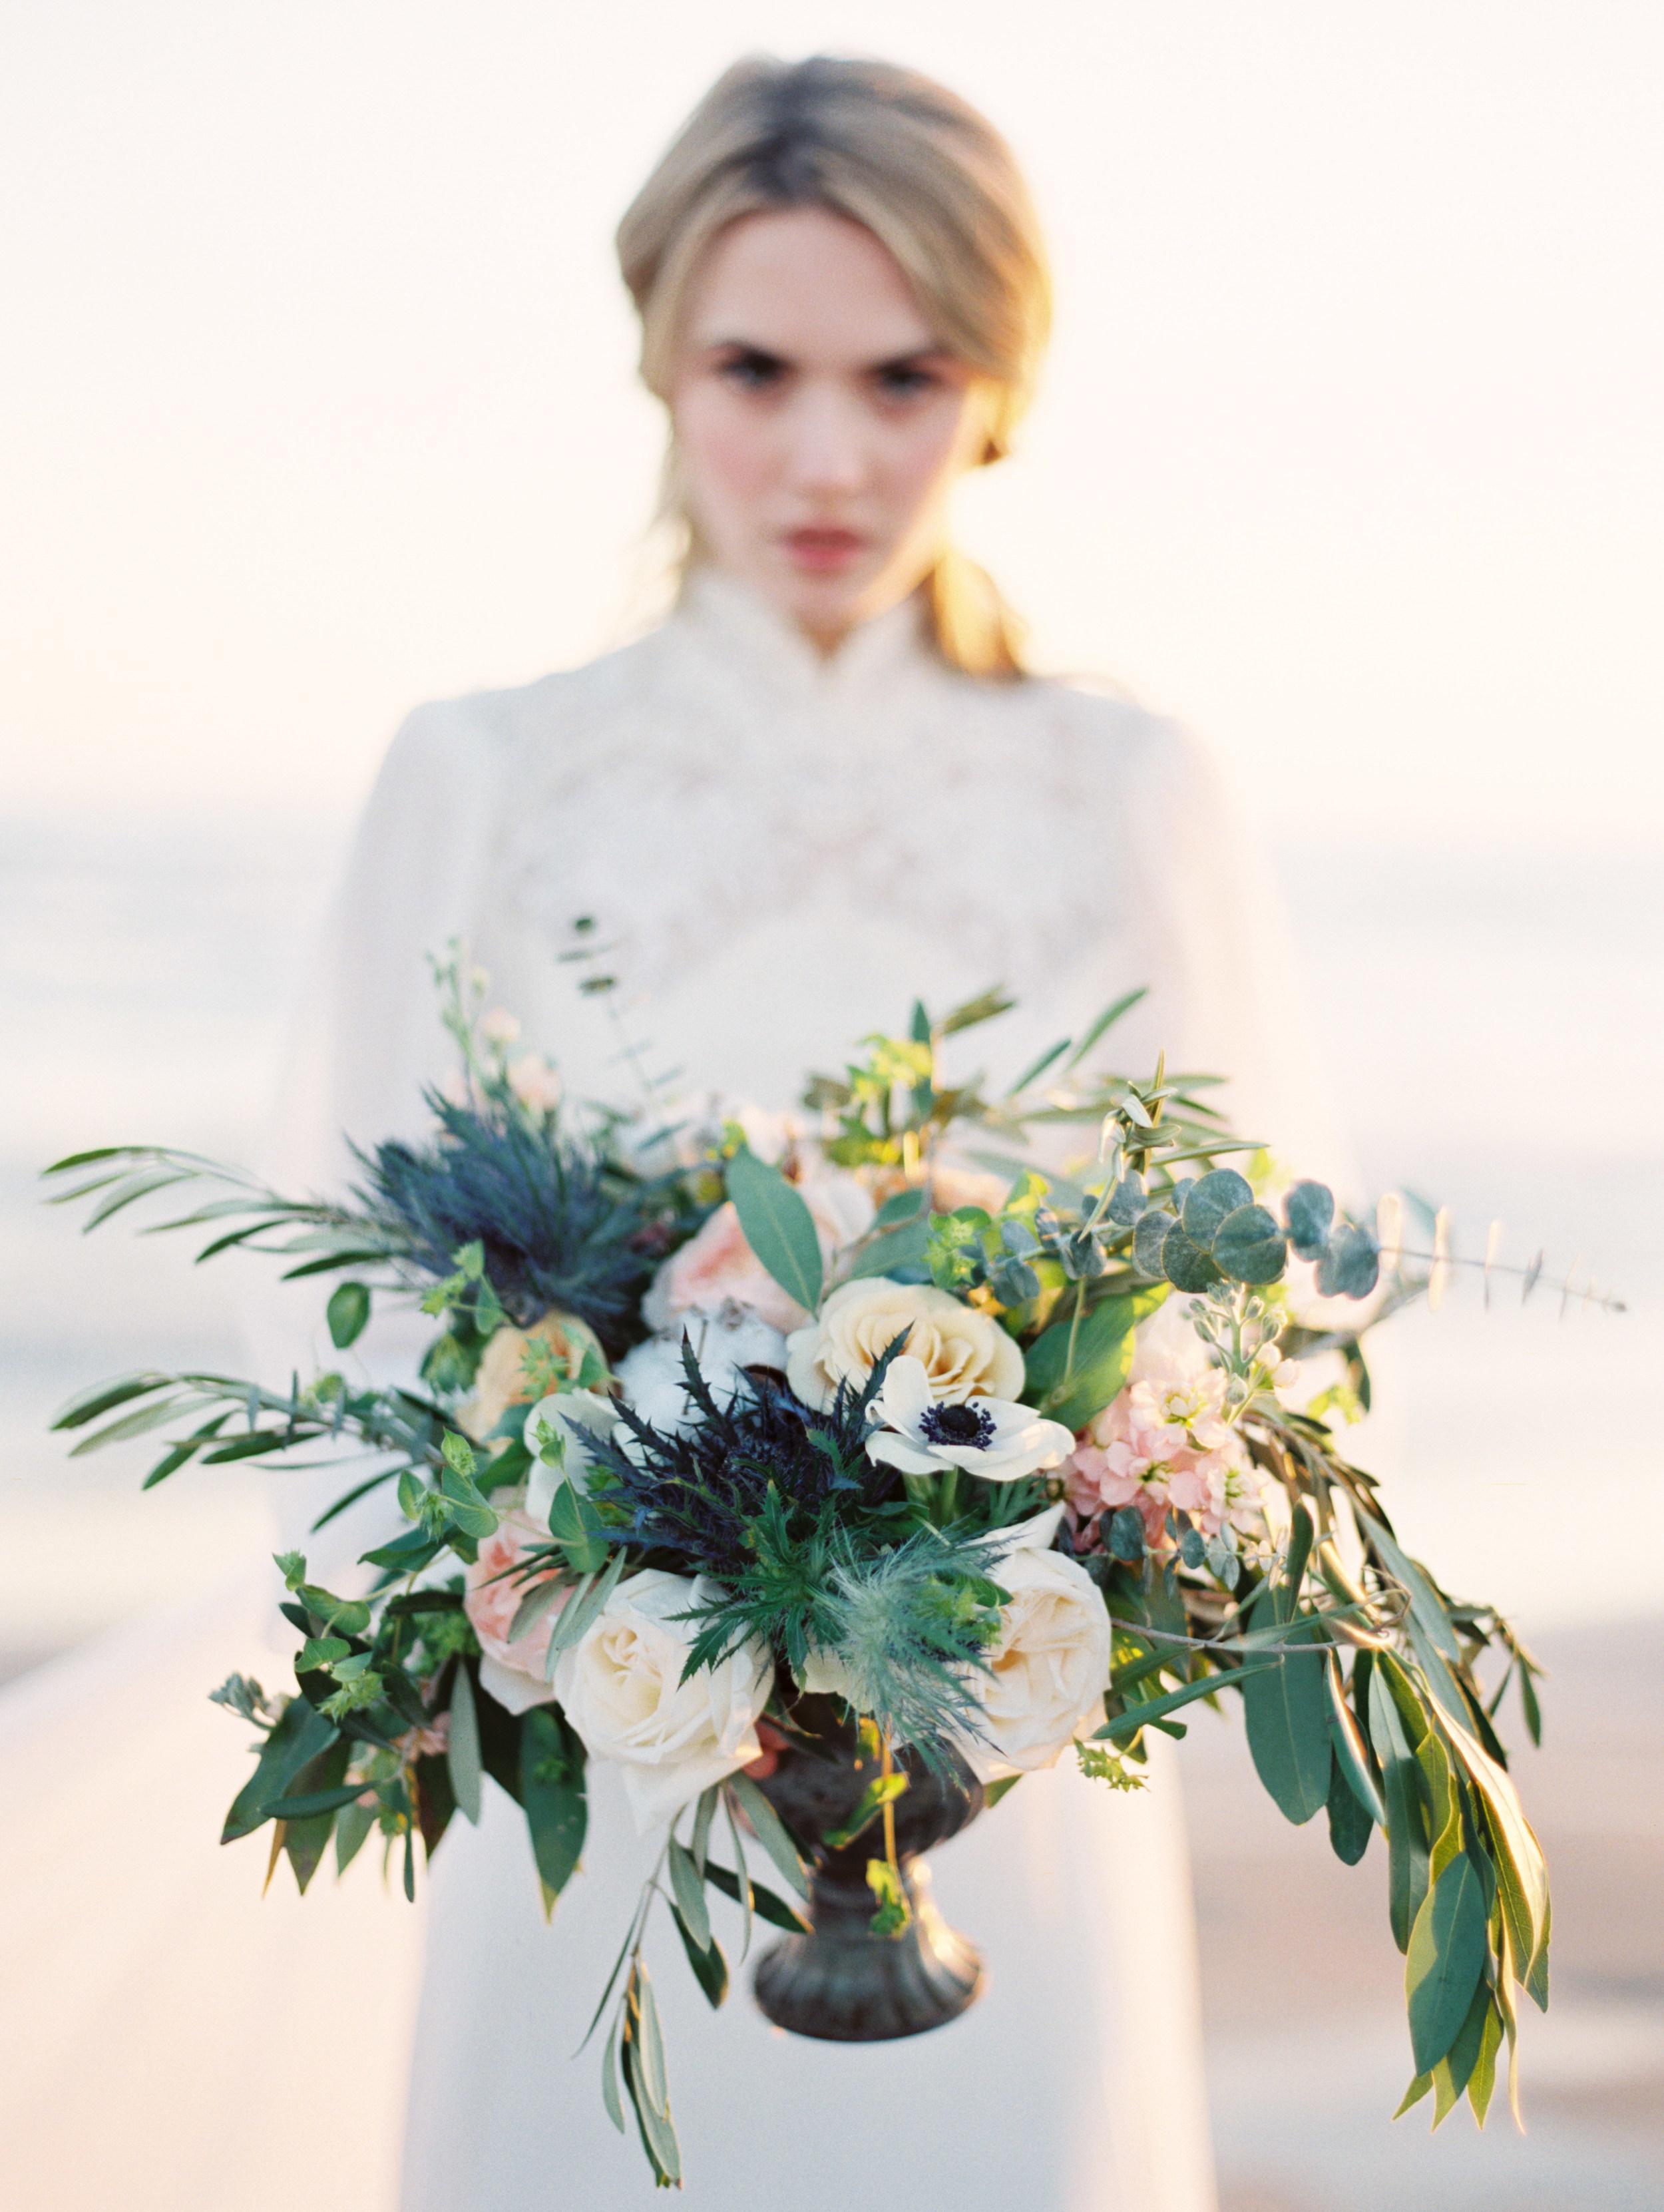 Kyle John l Fine Art Wedding Photography l Chicago, Copenhagen, California, New York, Destination l Blog l Sea and Sand_12